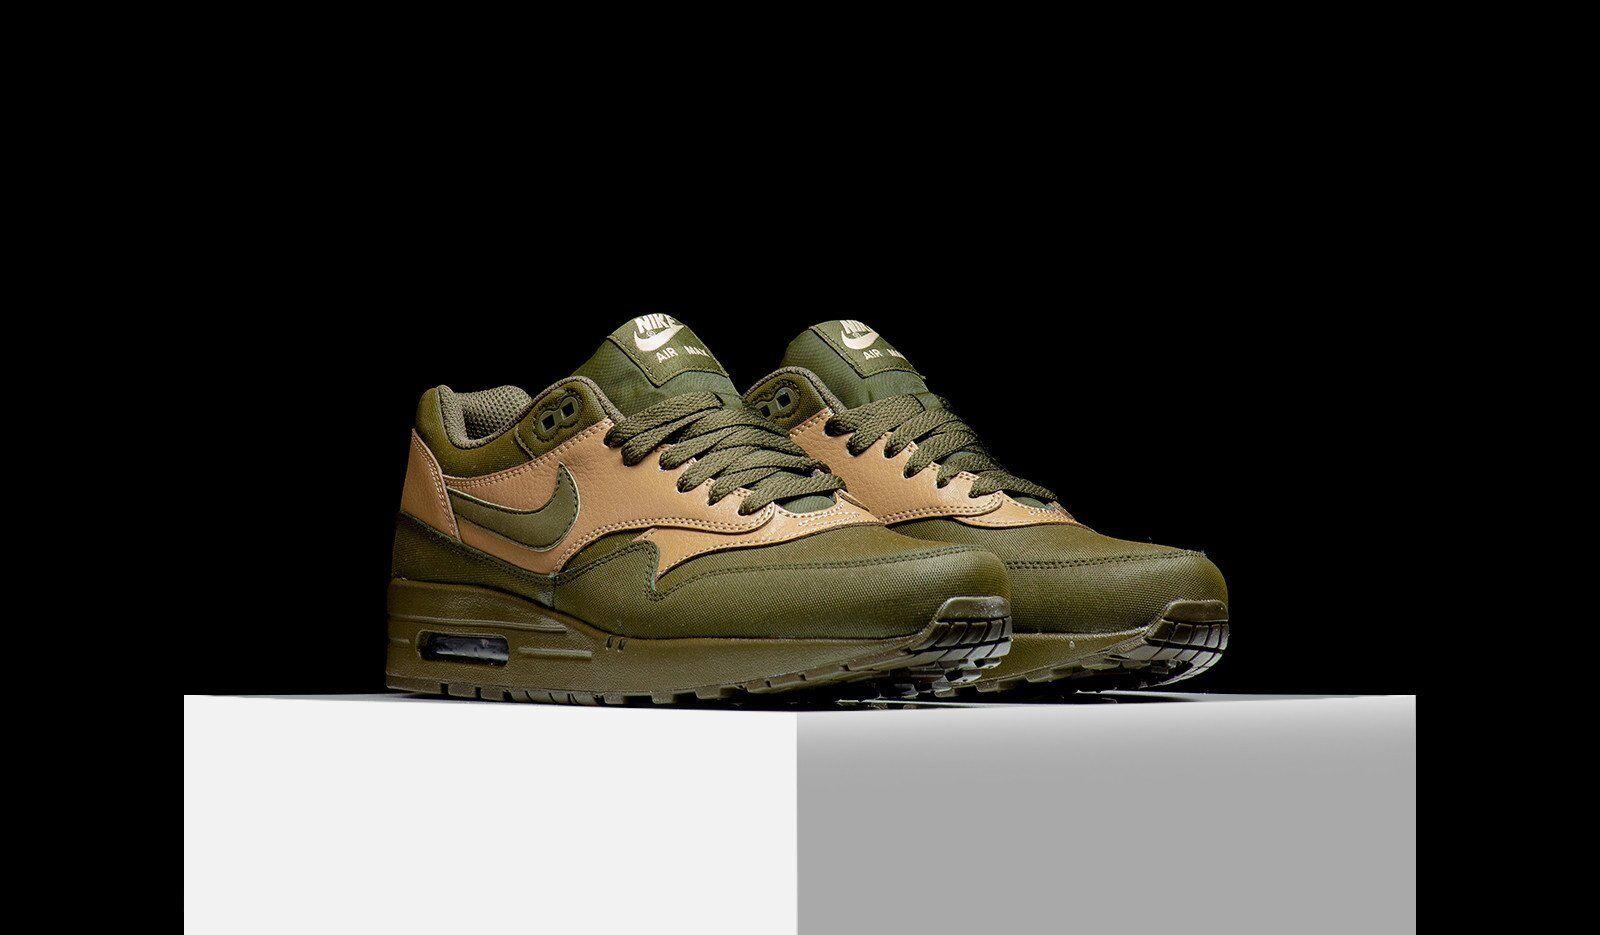 Nike air max max max 1 leder premium dark loden htm oberste 705282 300 männer sz 10,5 9f280b